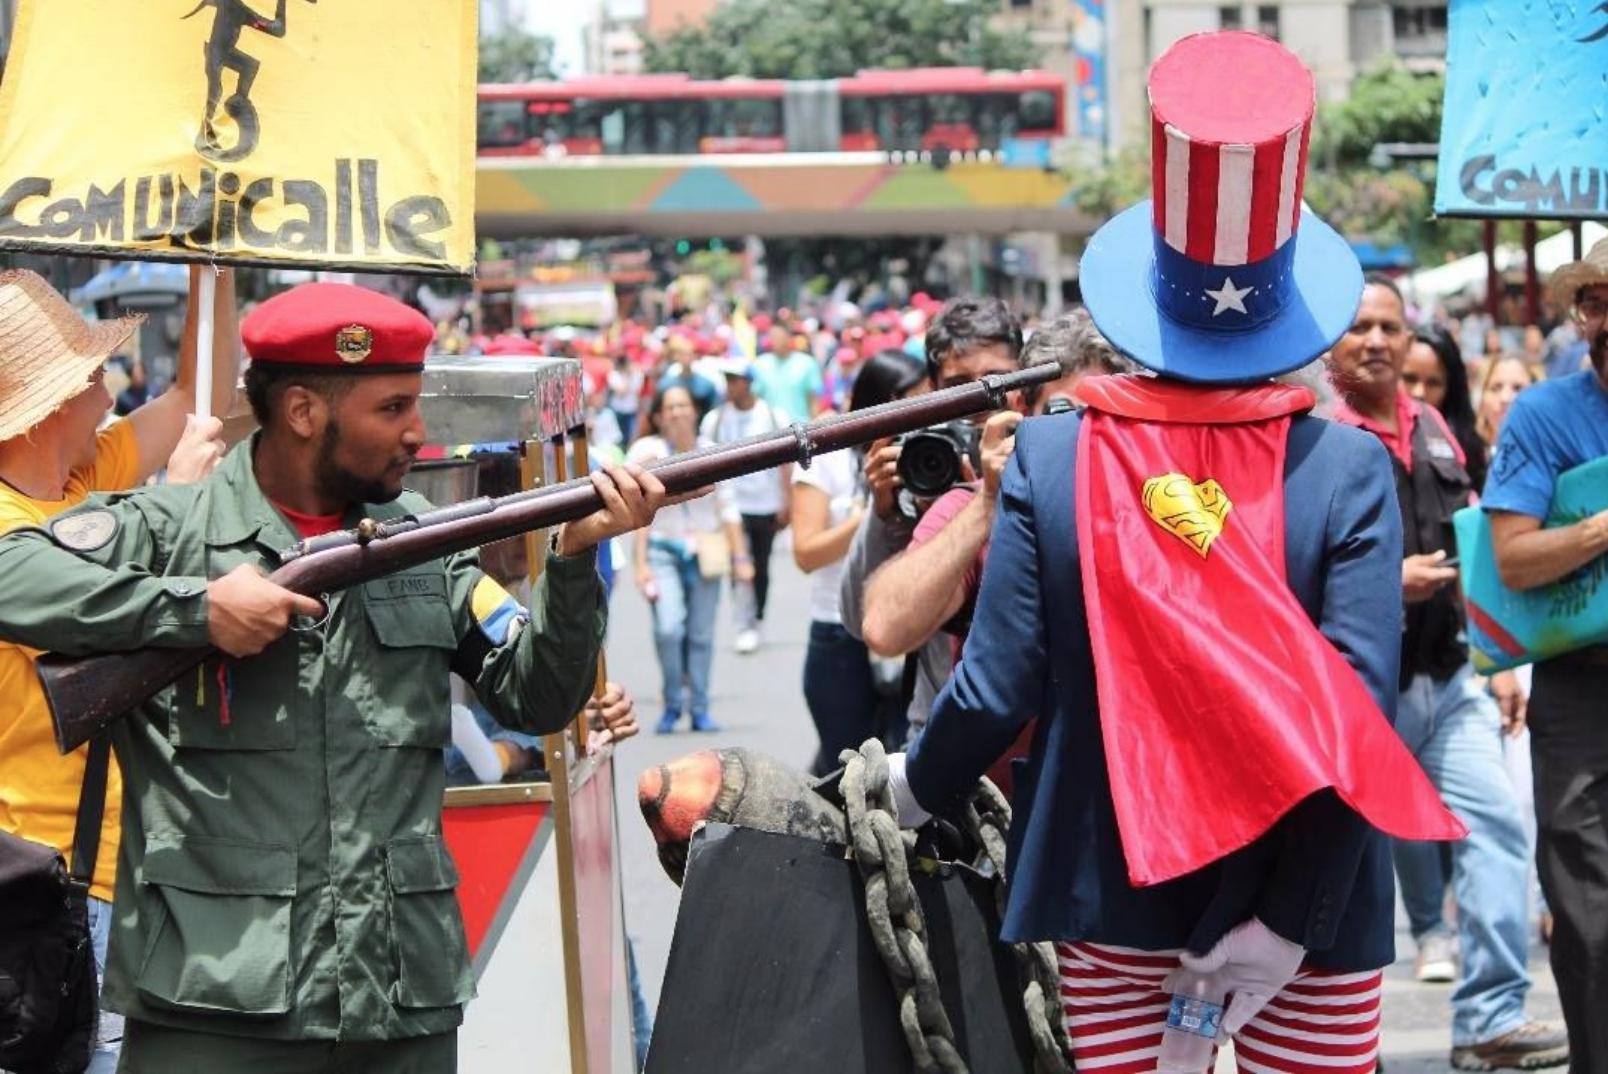 Venezuela Anti-Imperialist March August 2017